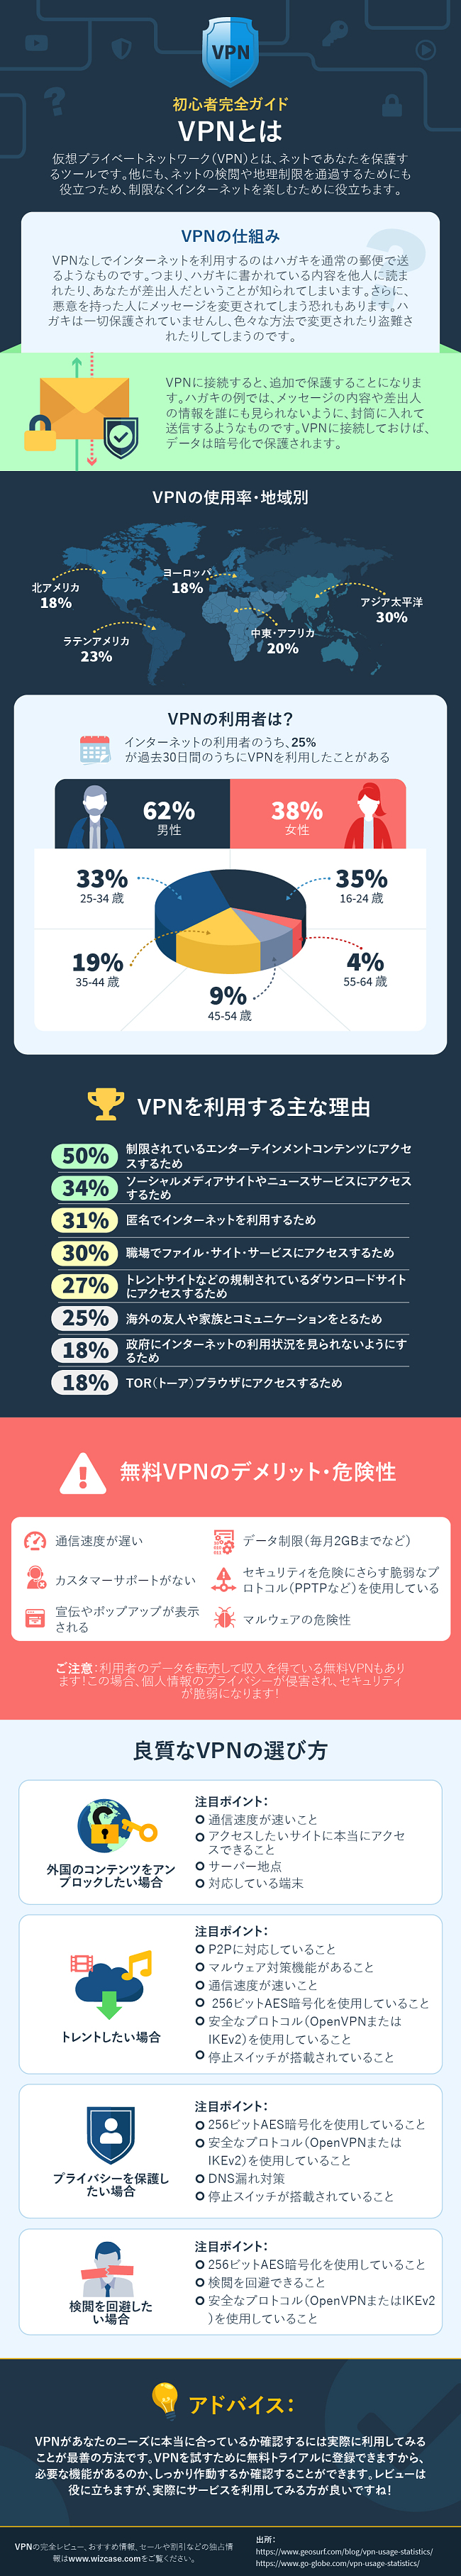 VPNとは何かに関するインフォグラフィック